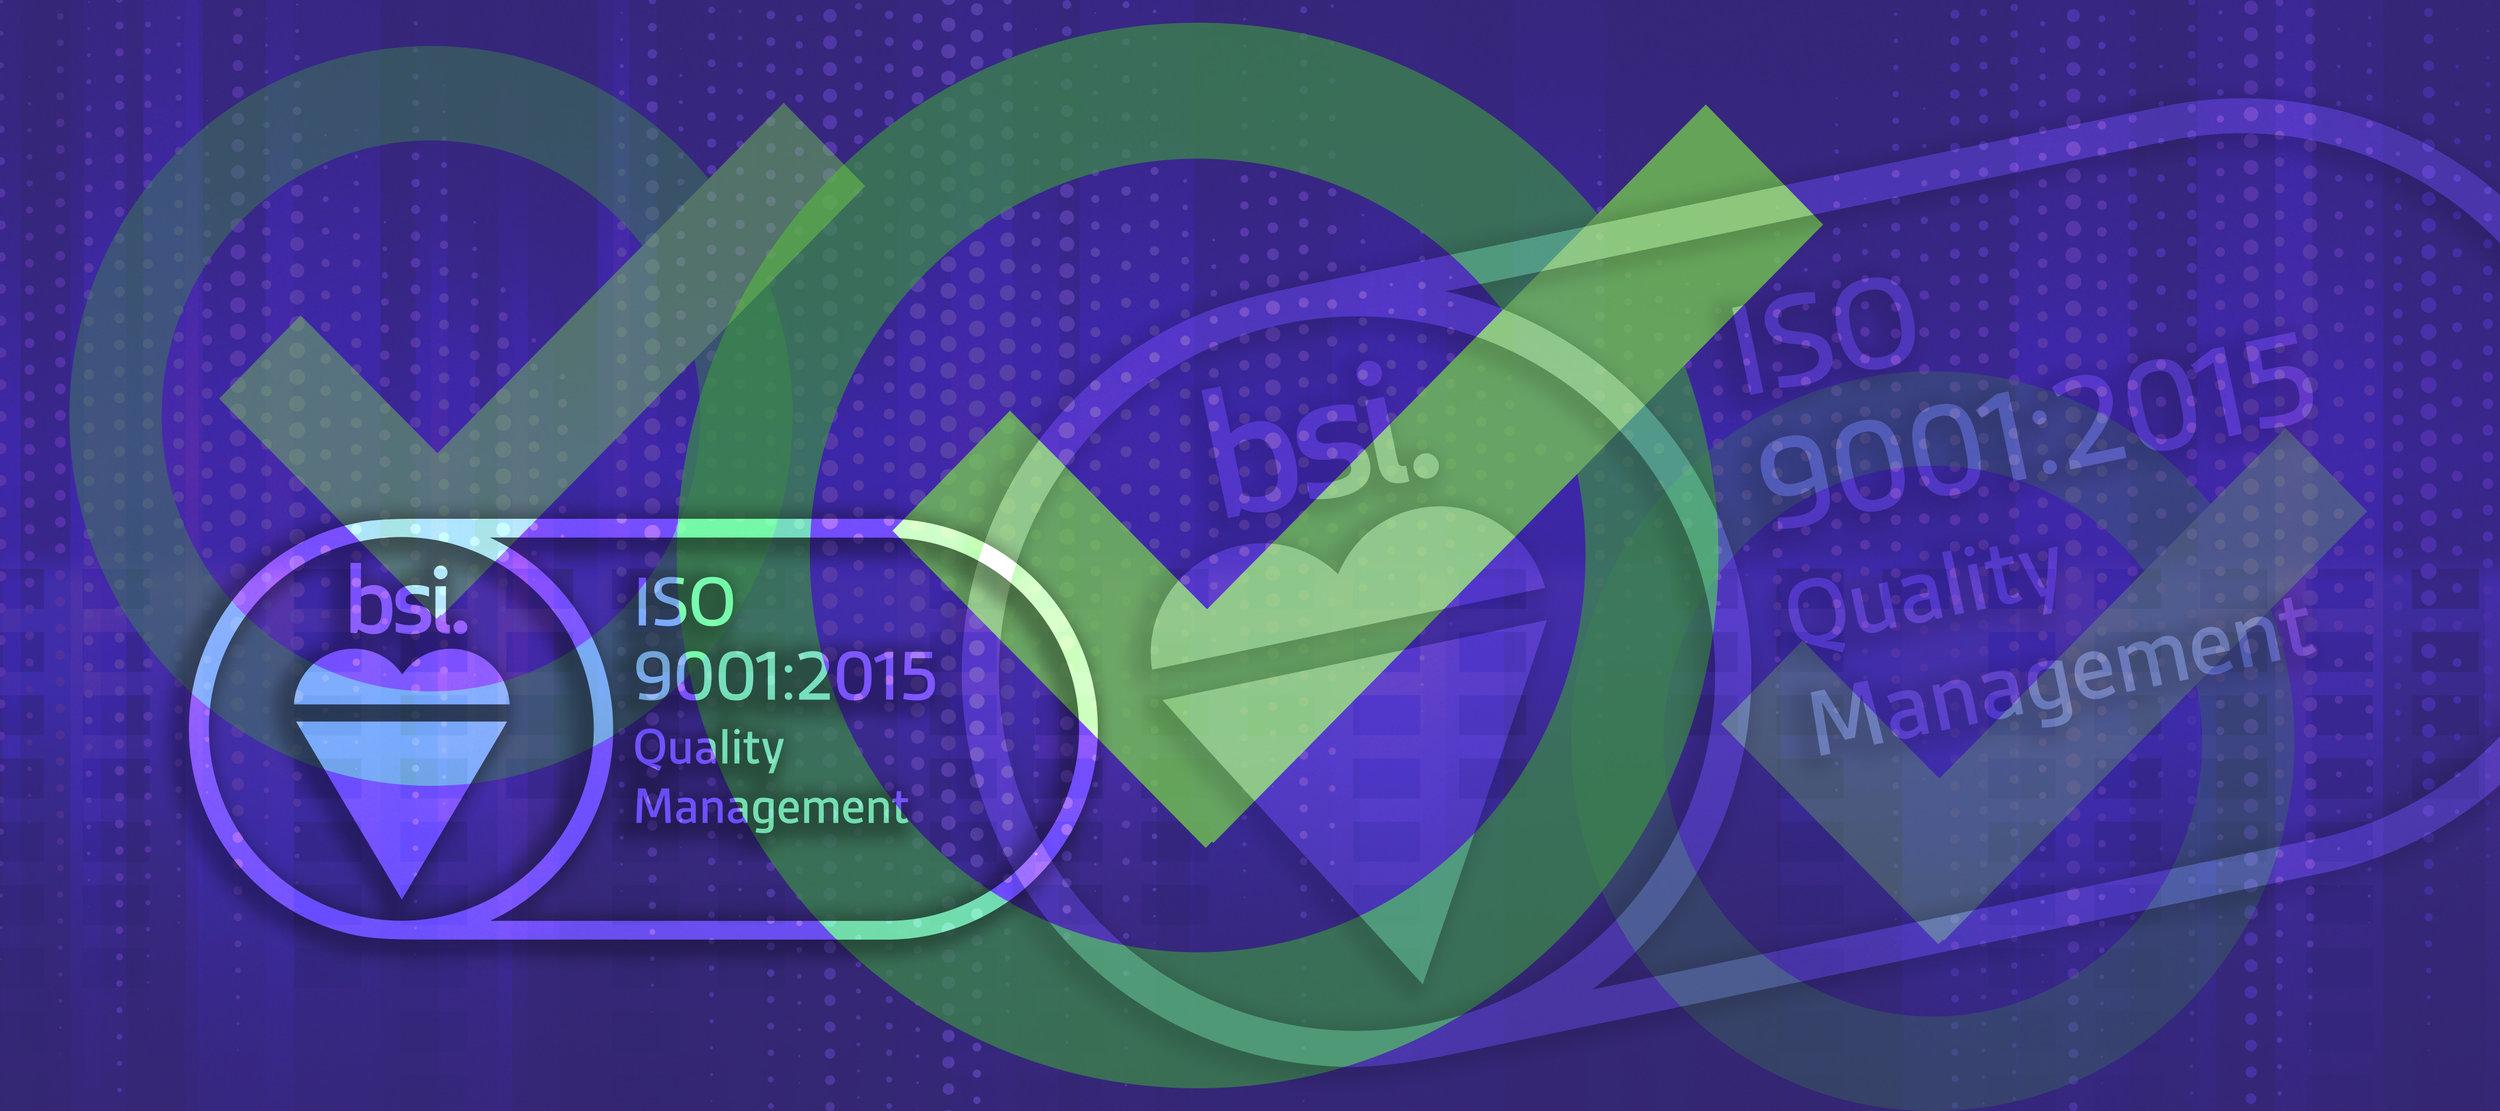 ISO Audit Press Release Image (1).jpg